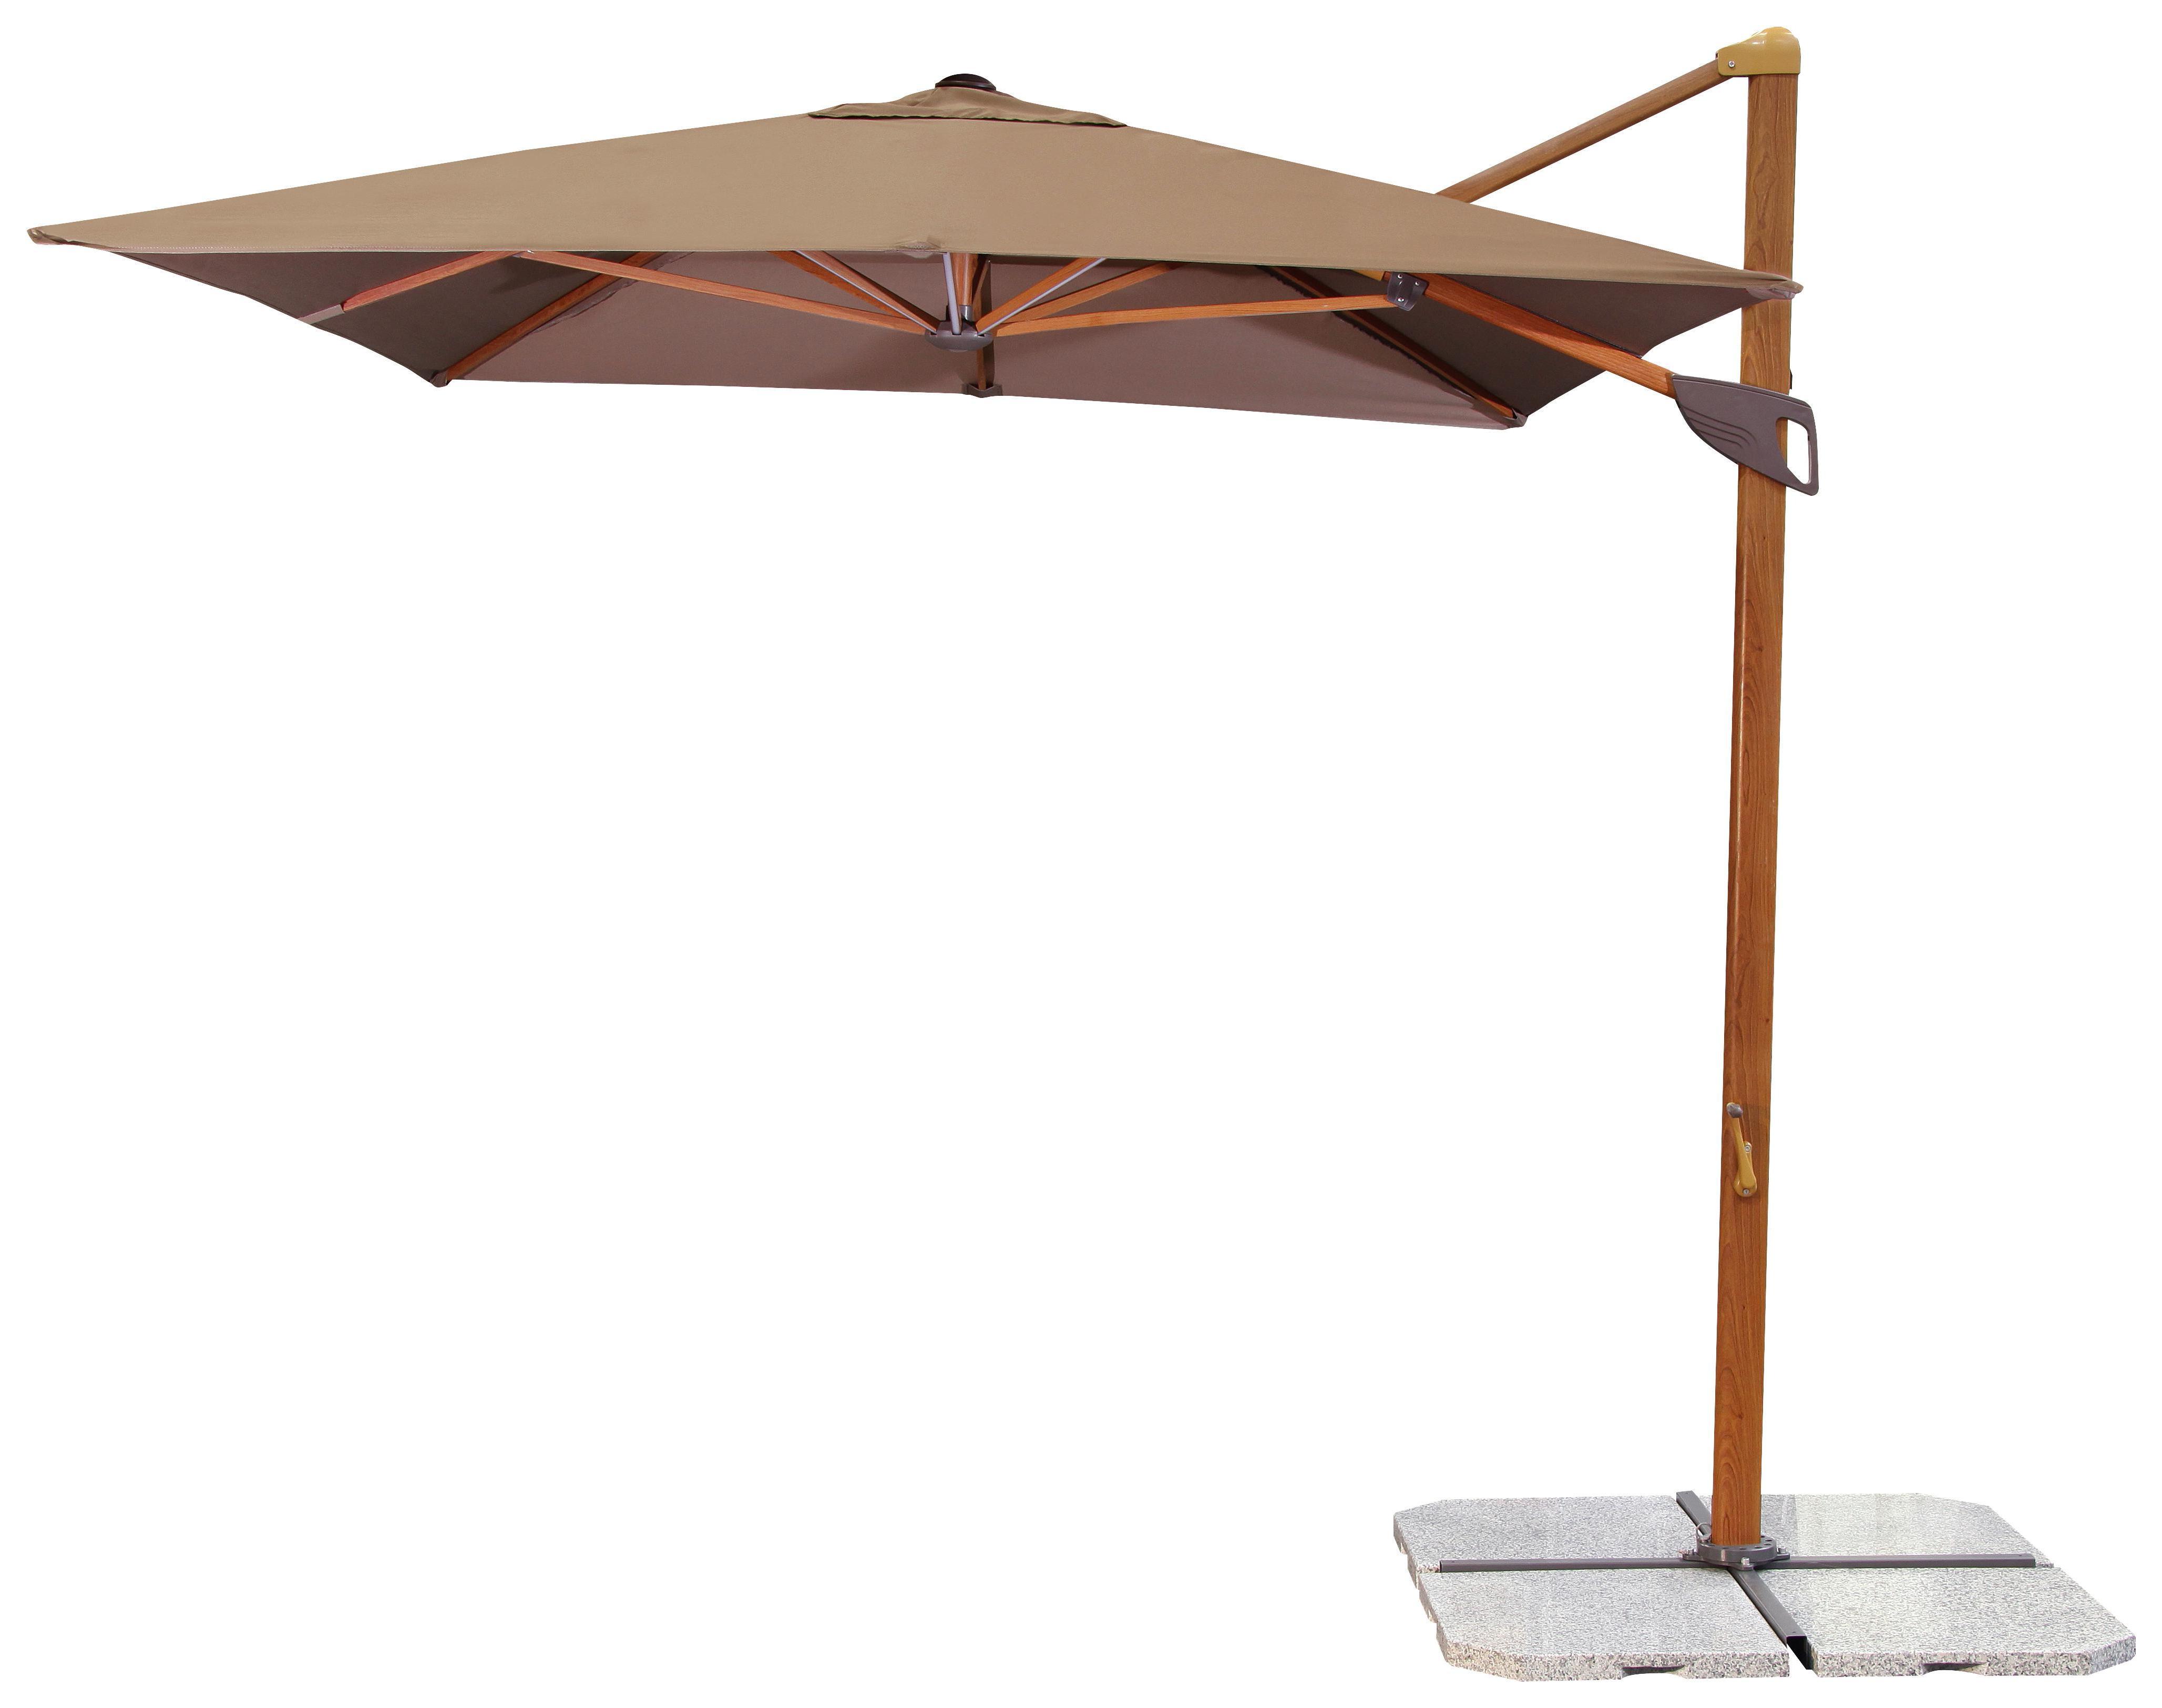 Taube Market Umbrellas Within Popular Sonnenschirme & Ampelschirme, Sonnenschirme Rechteckig Xxxlutz (View 19 of 20)